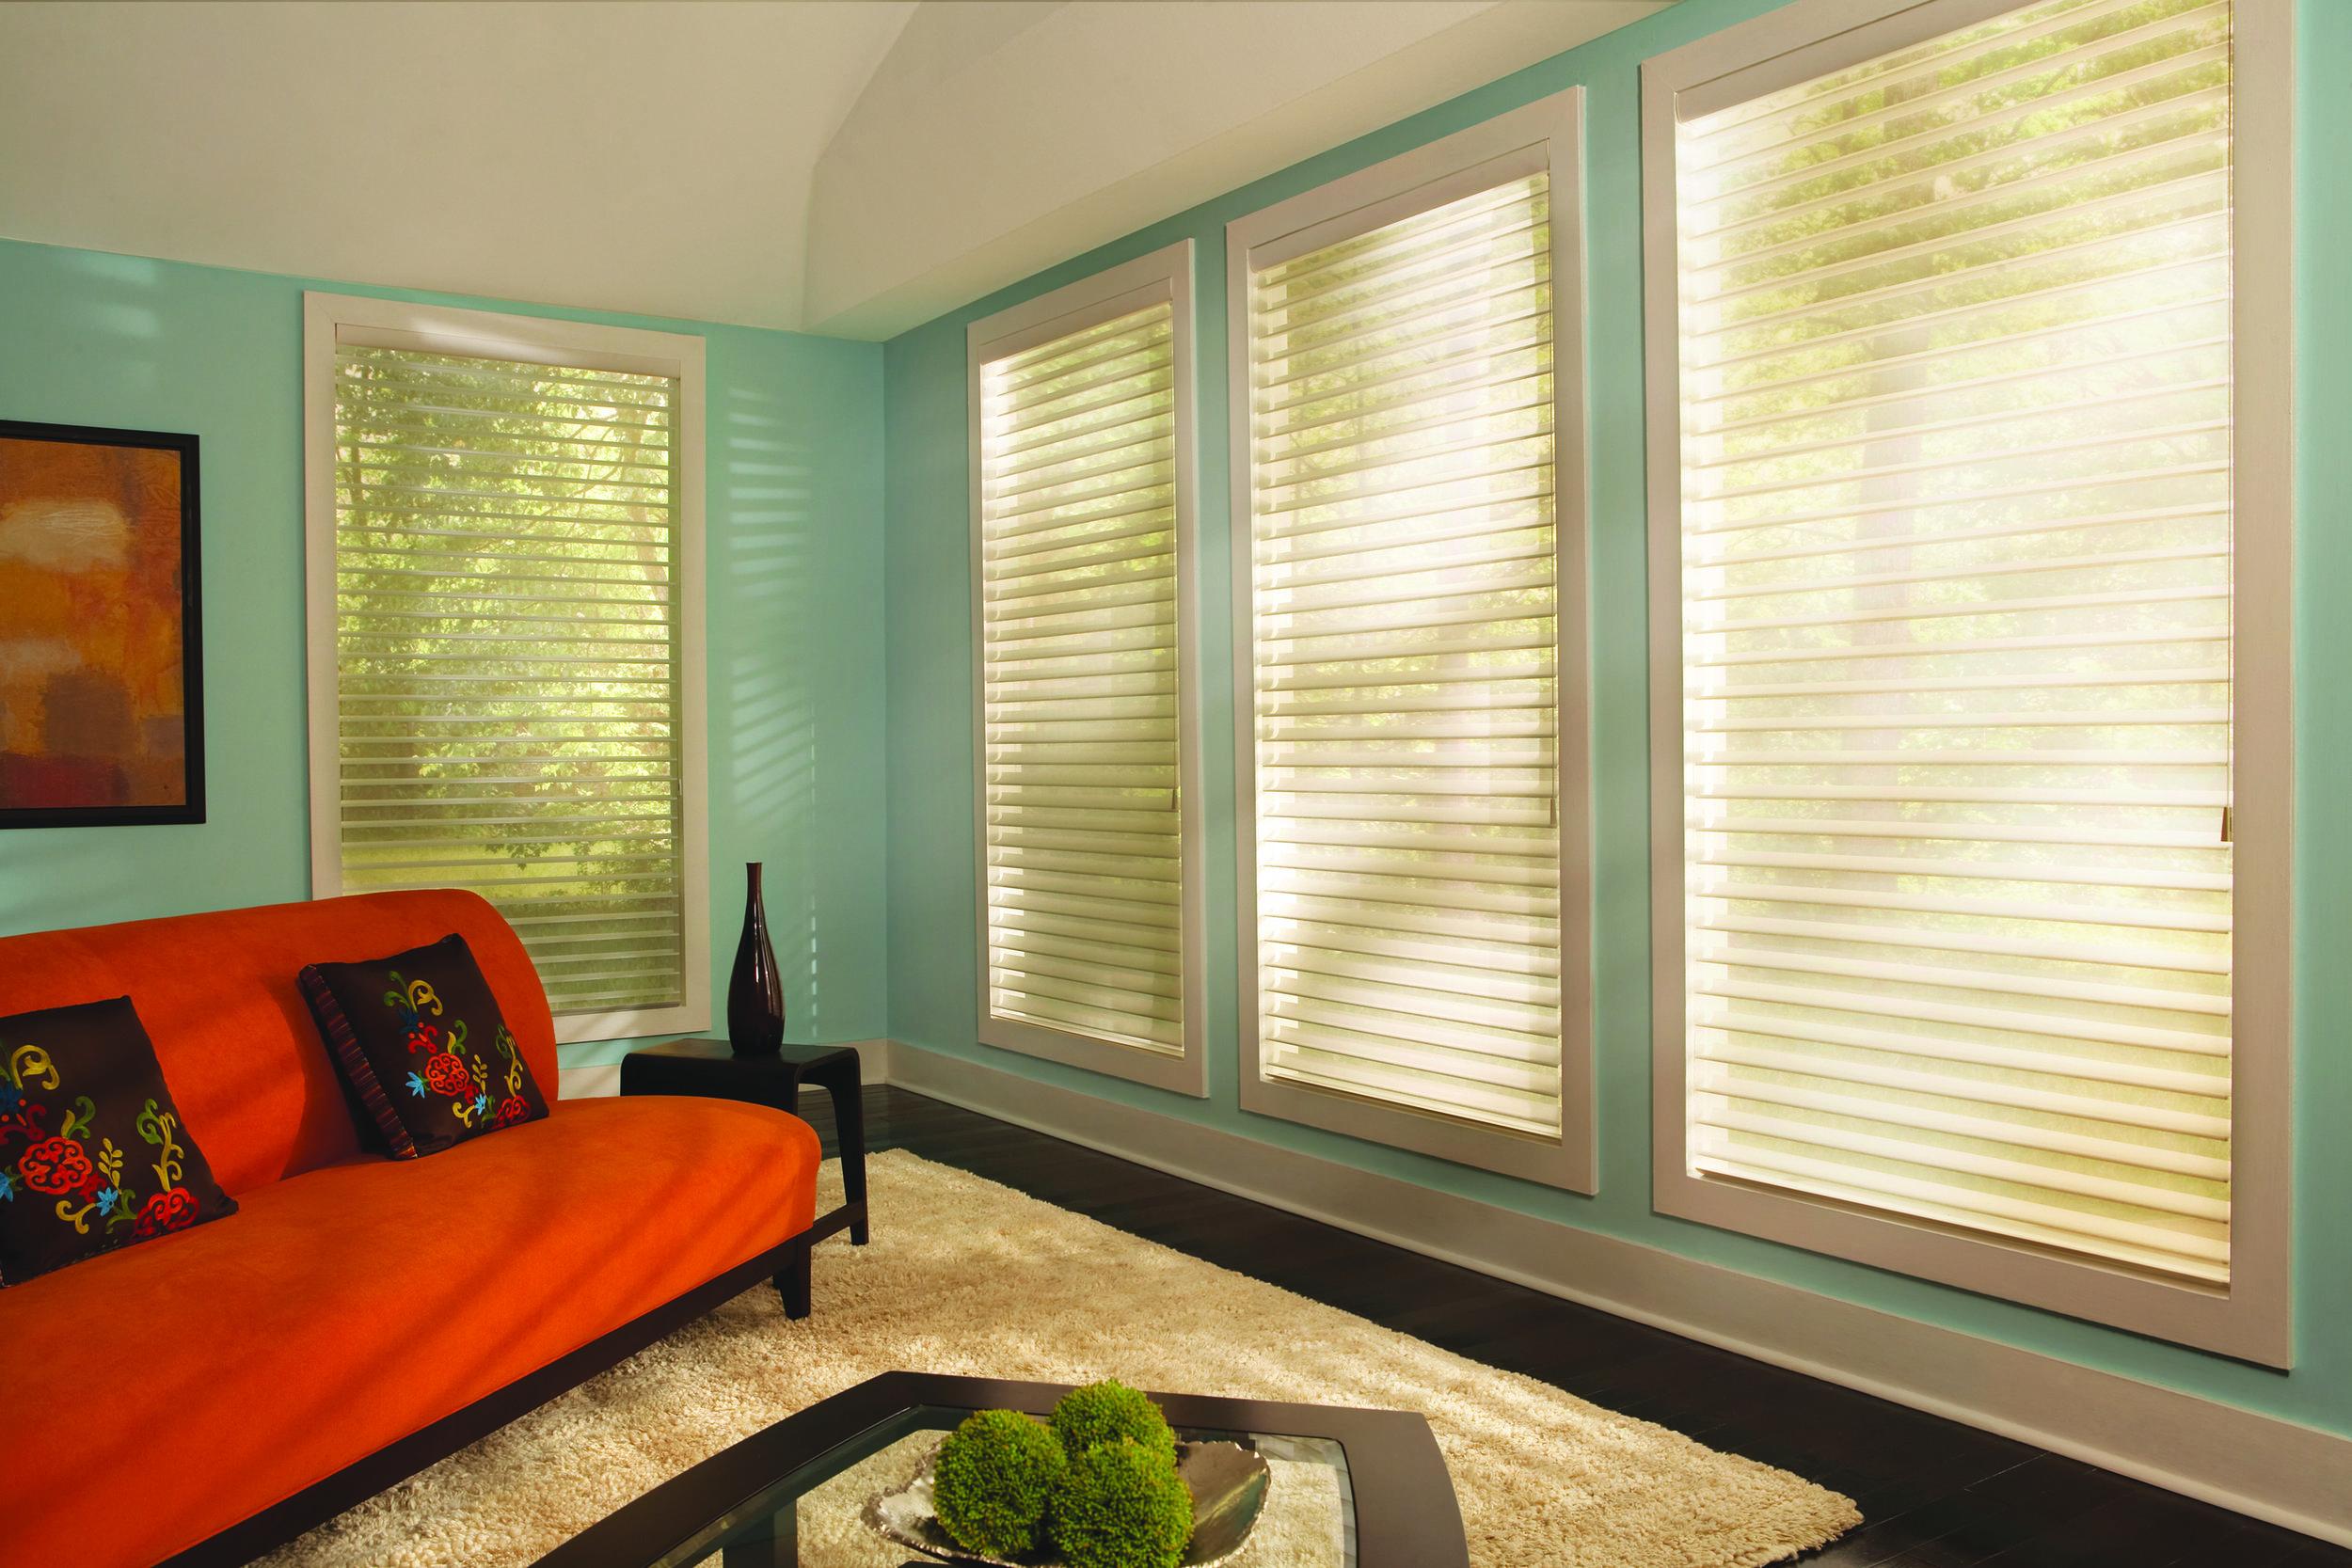 2010_NAN_2010_Watermark_Living Room_After.jpeg